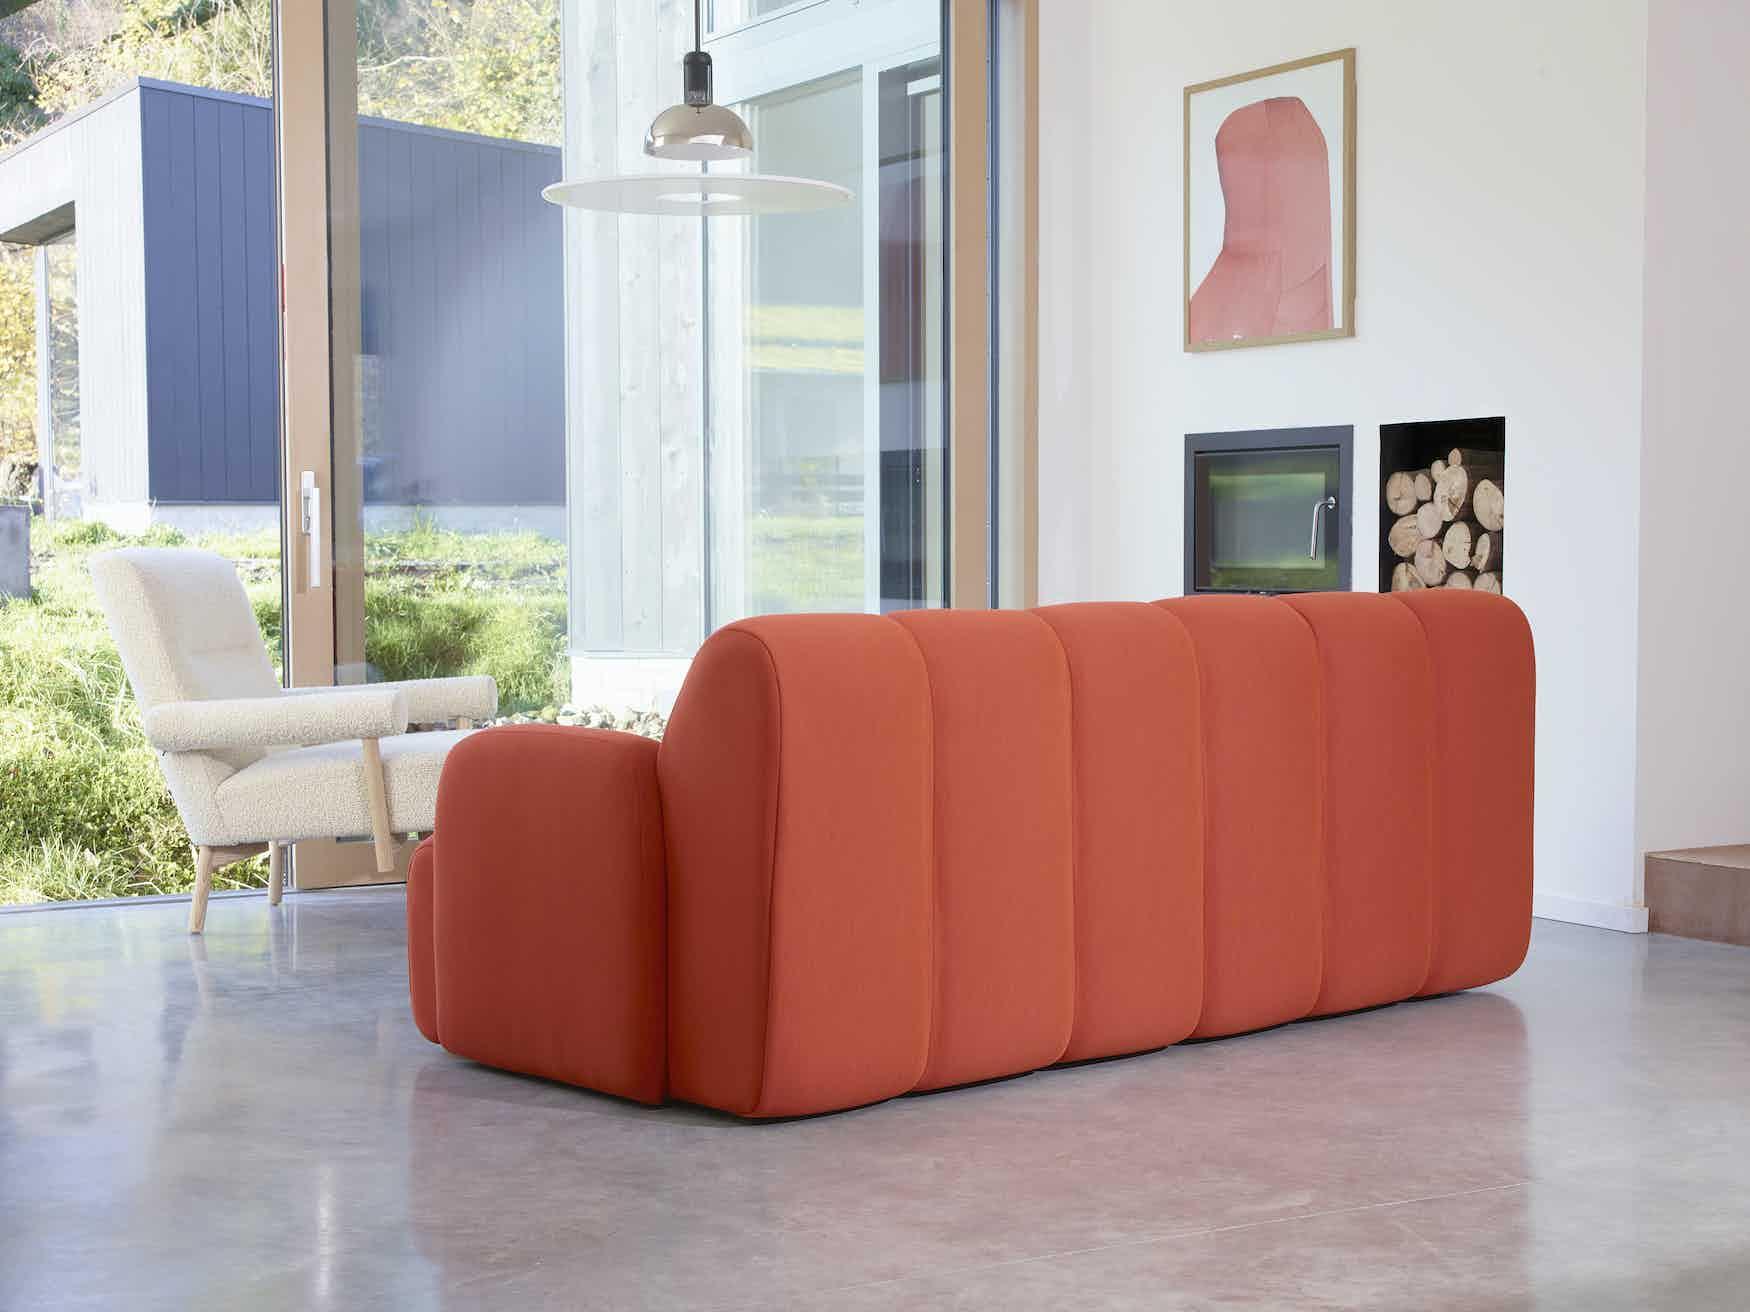 Scp furniture pillar sofa back insitu haute living